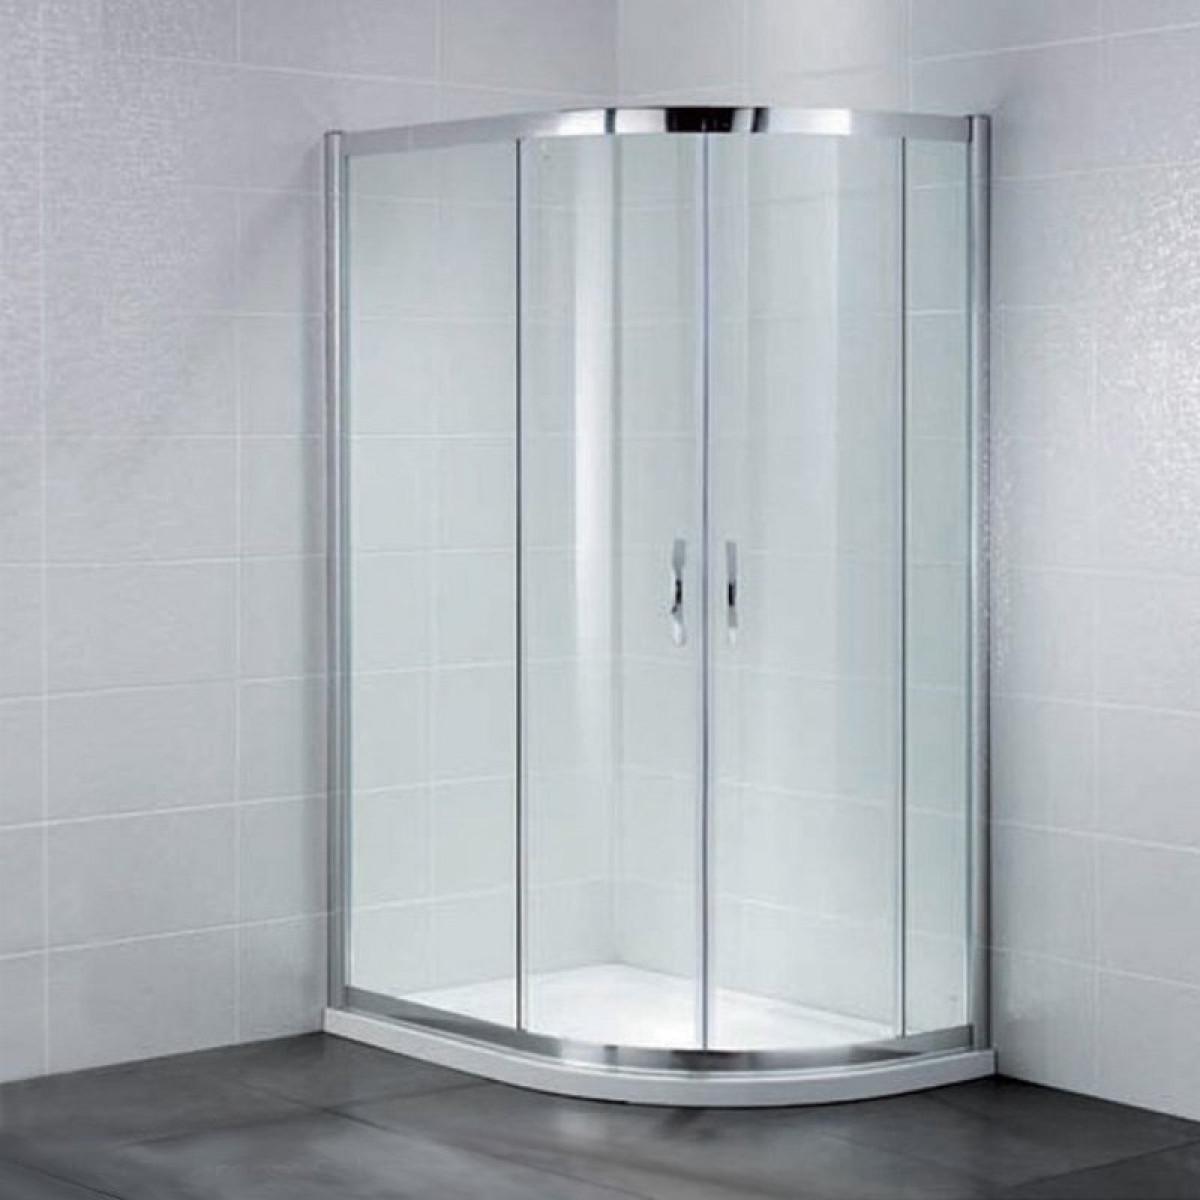 April Identiti2 Offset Double Door Quadrant Shower